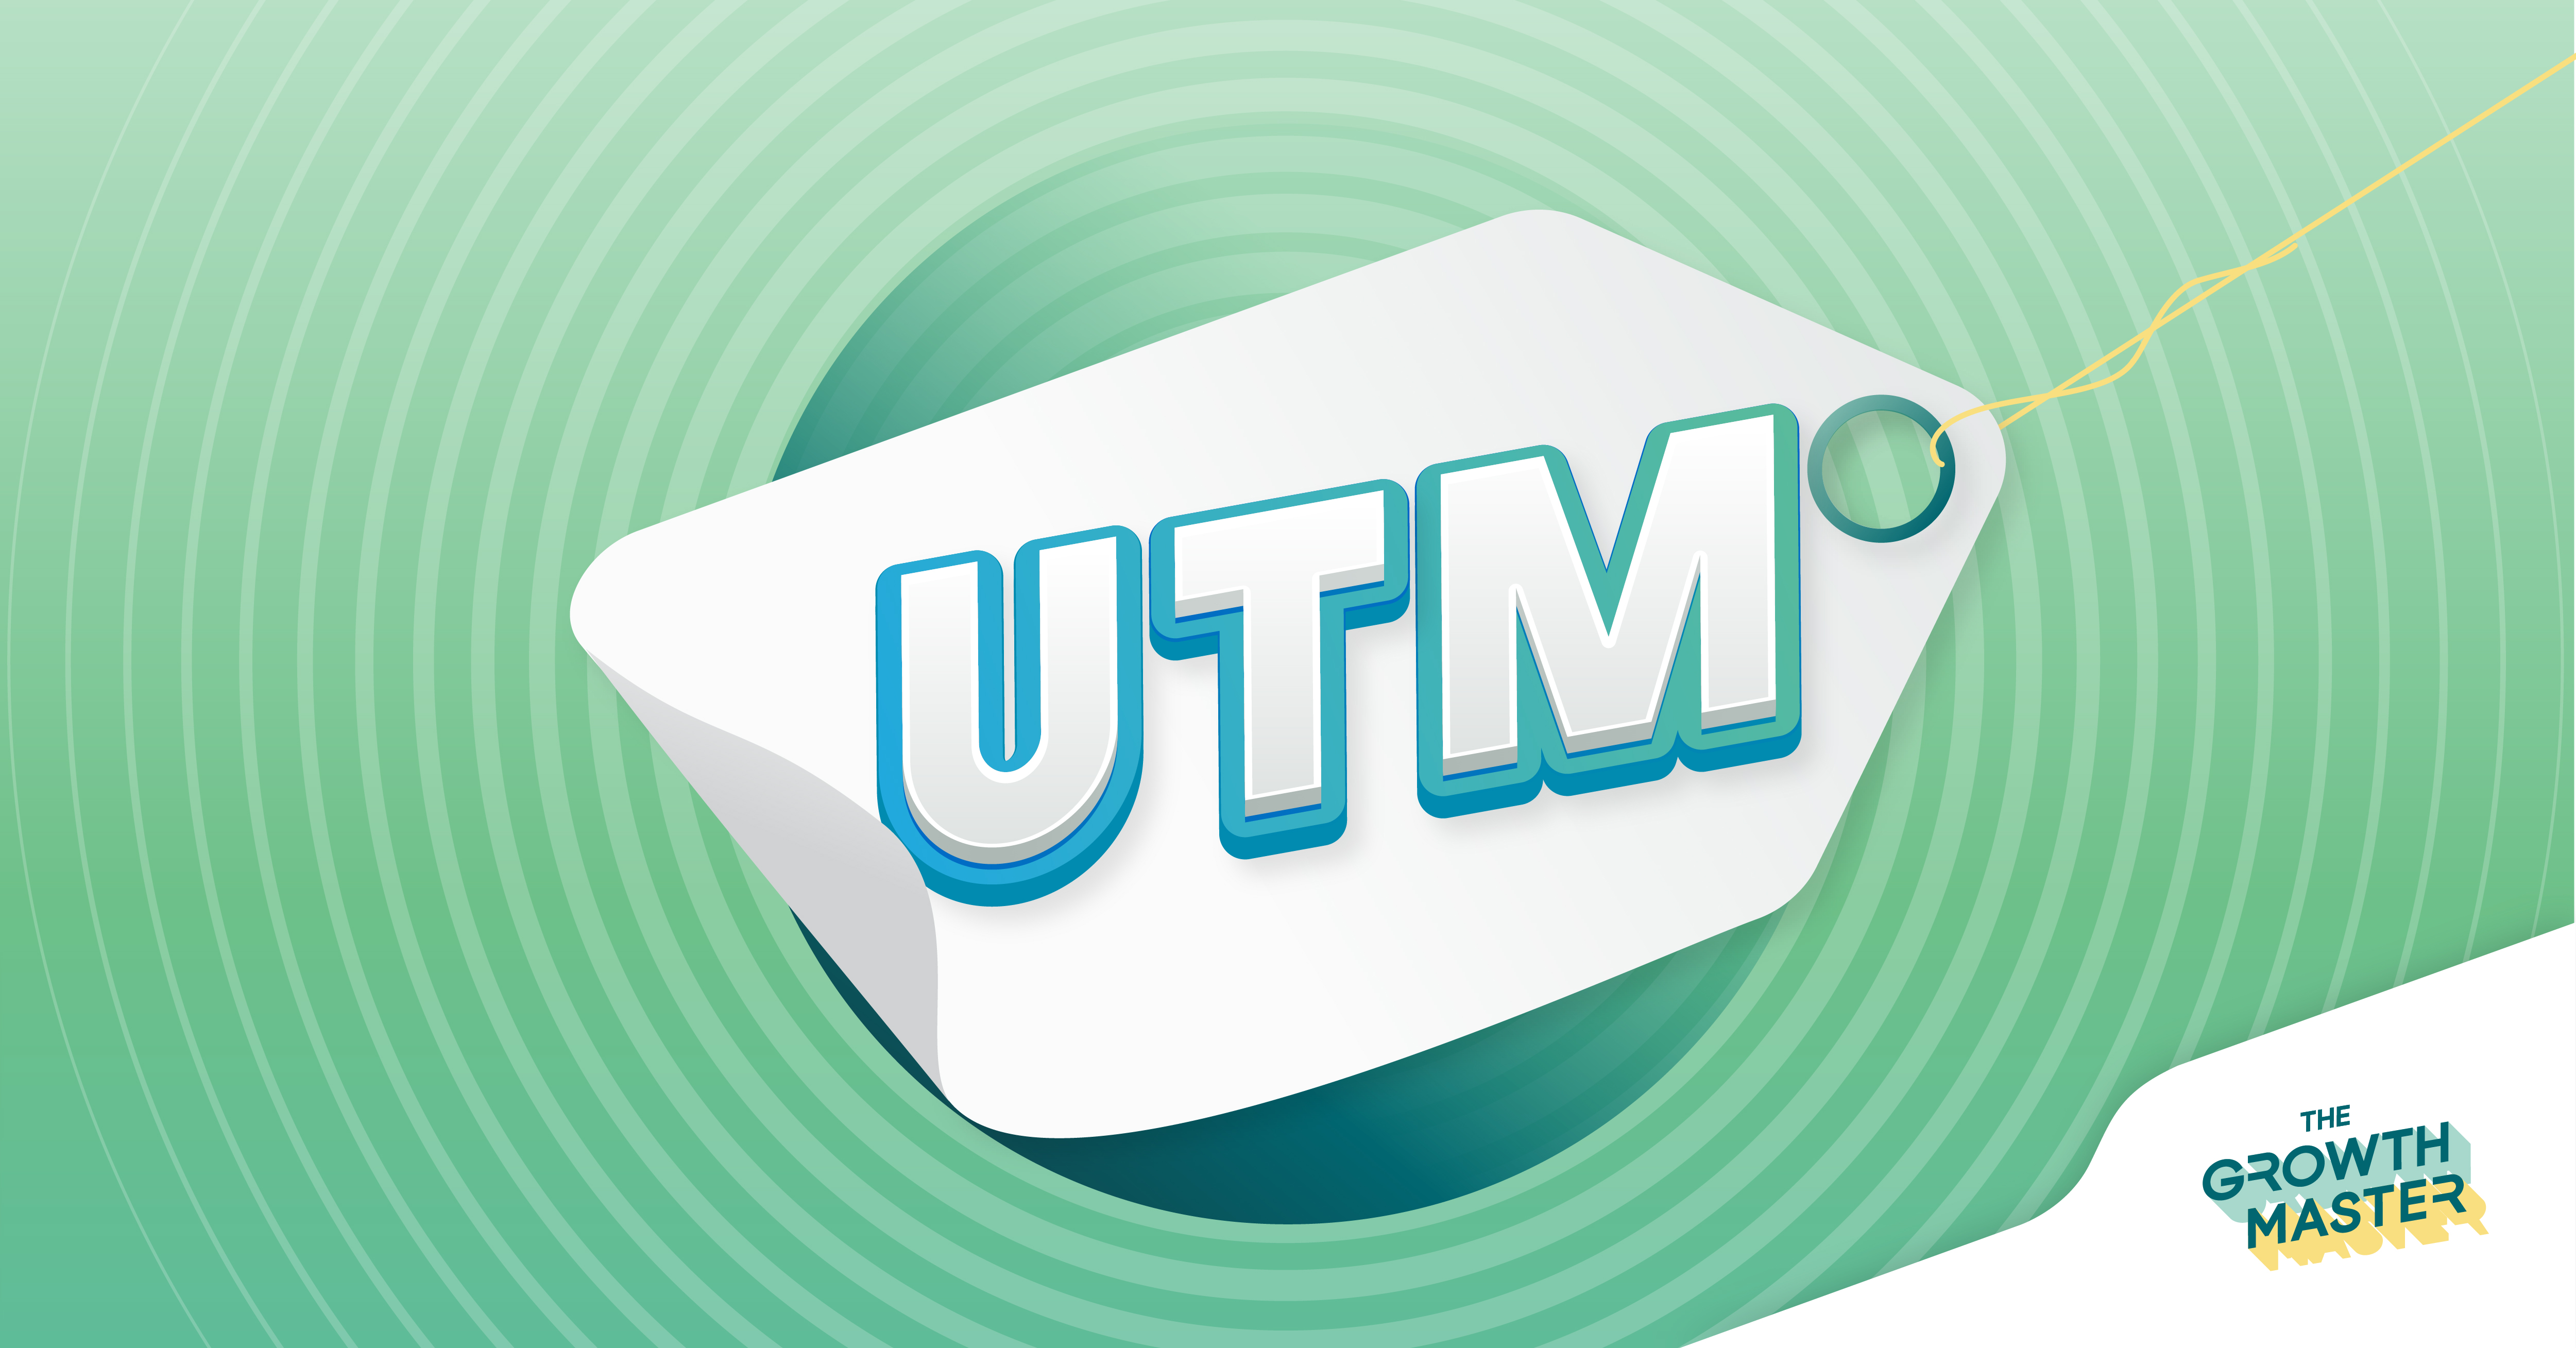 UTM Parameters Guide : วิธีการติดตาม Traffic และวิเคราะห์พฤติกรรมของลูกค้าด้วยการใช้ UTM